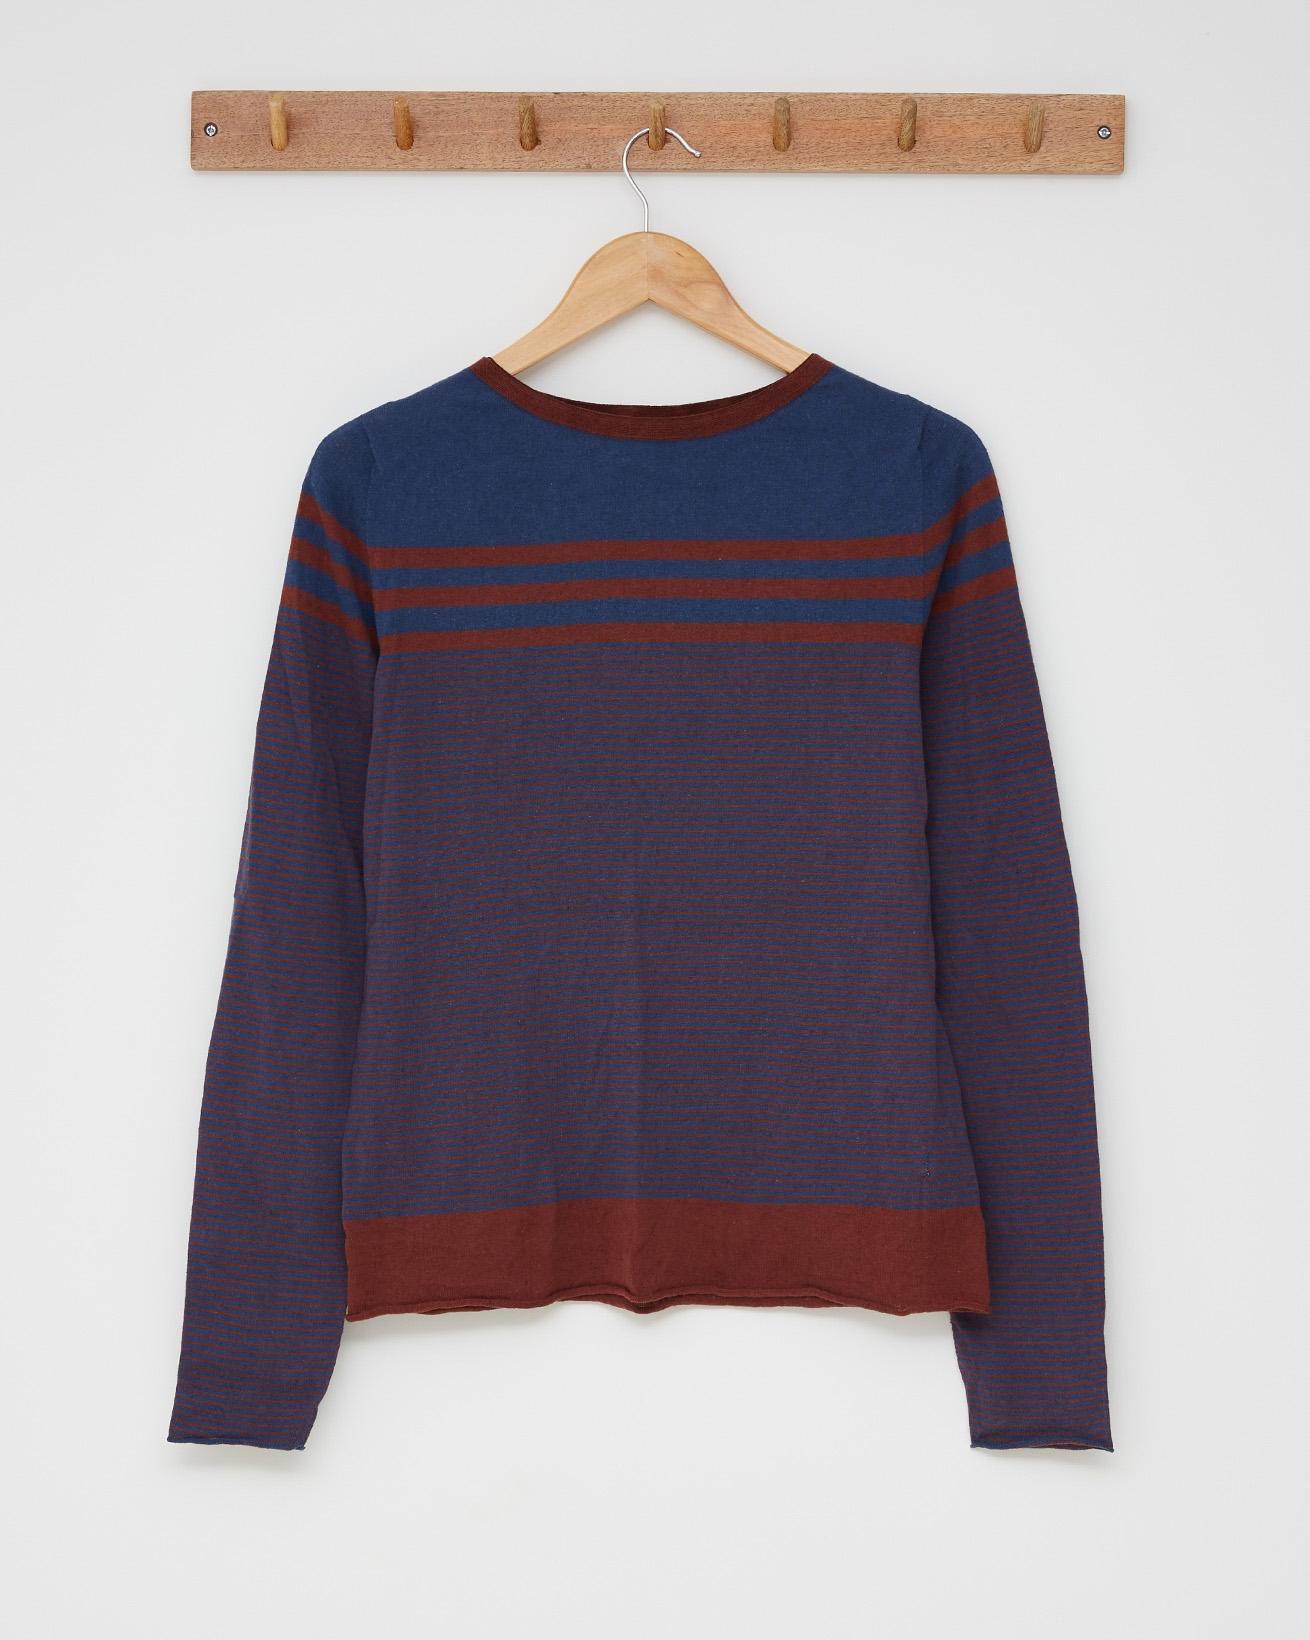 Stripey cotton crew top - Size Small - Rust, icelandic blue - 2521